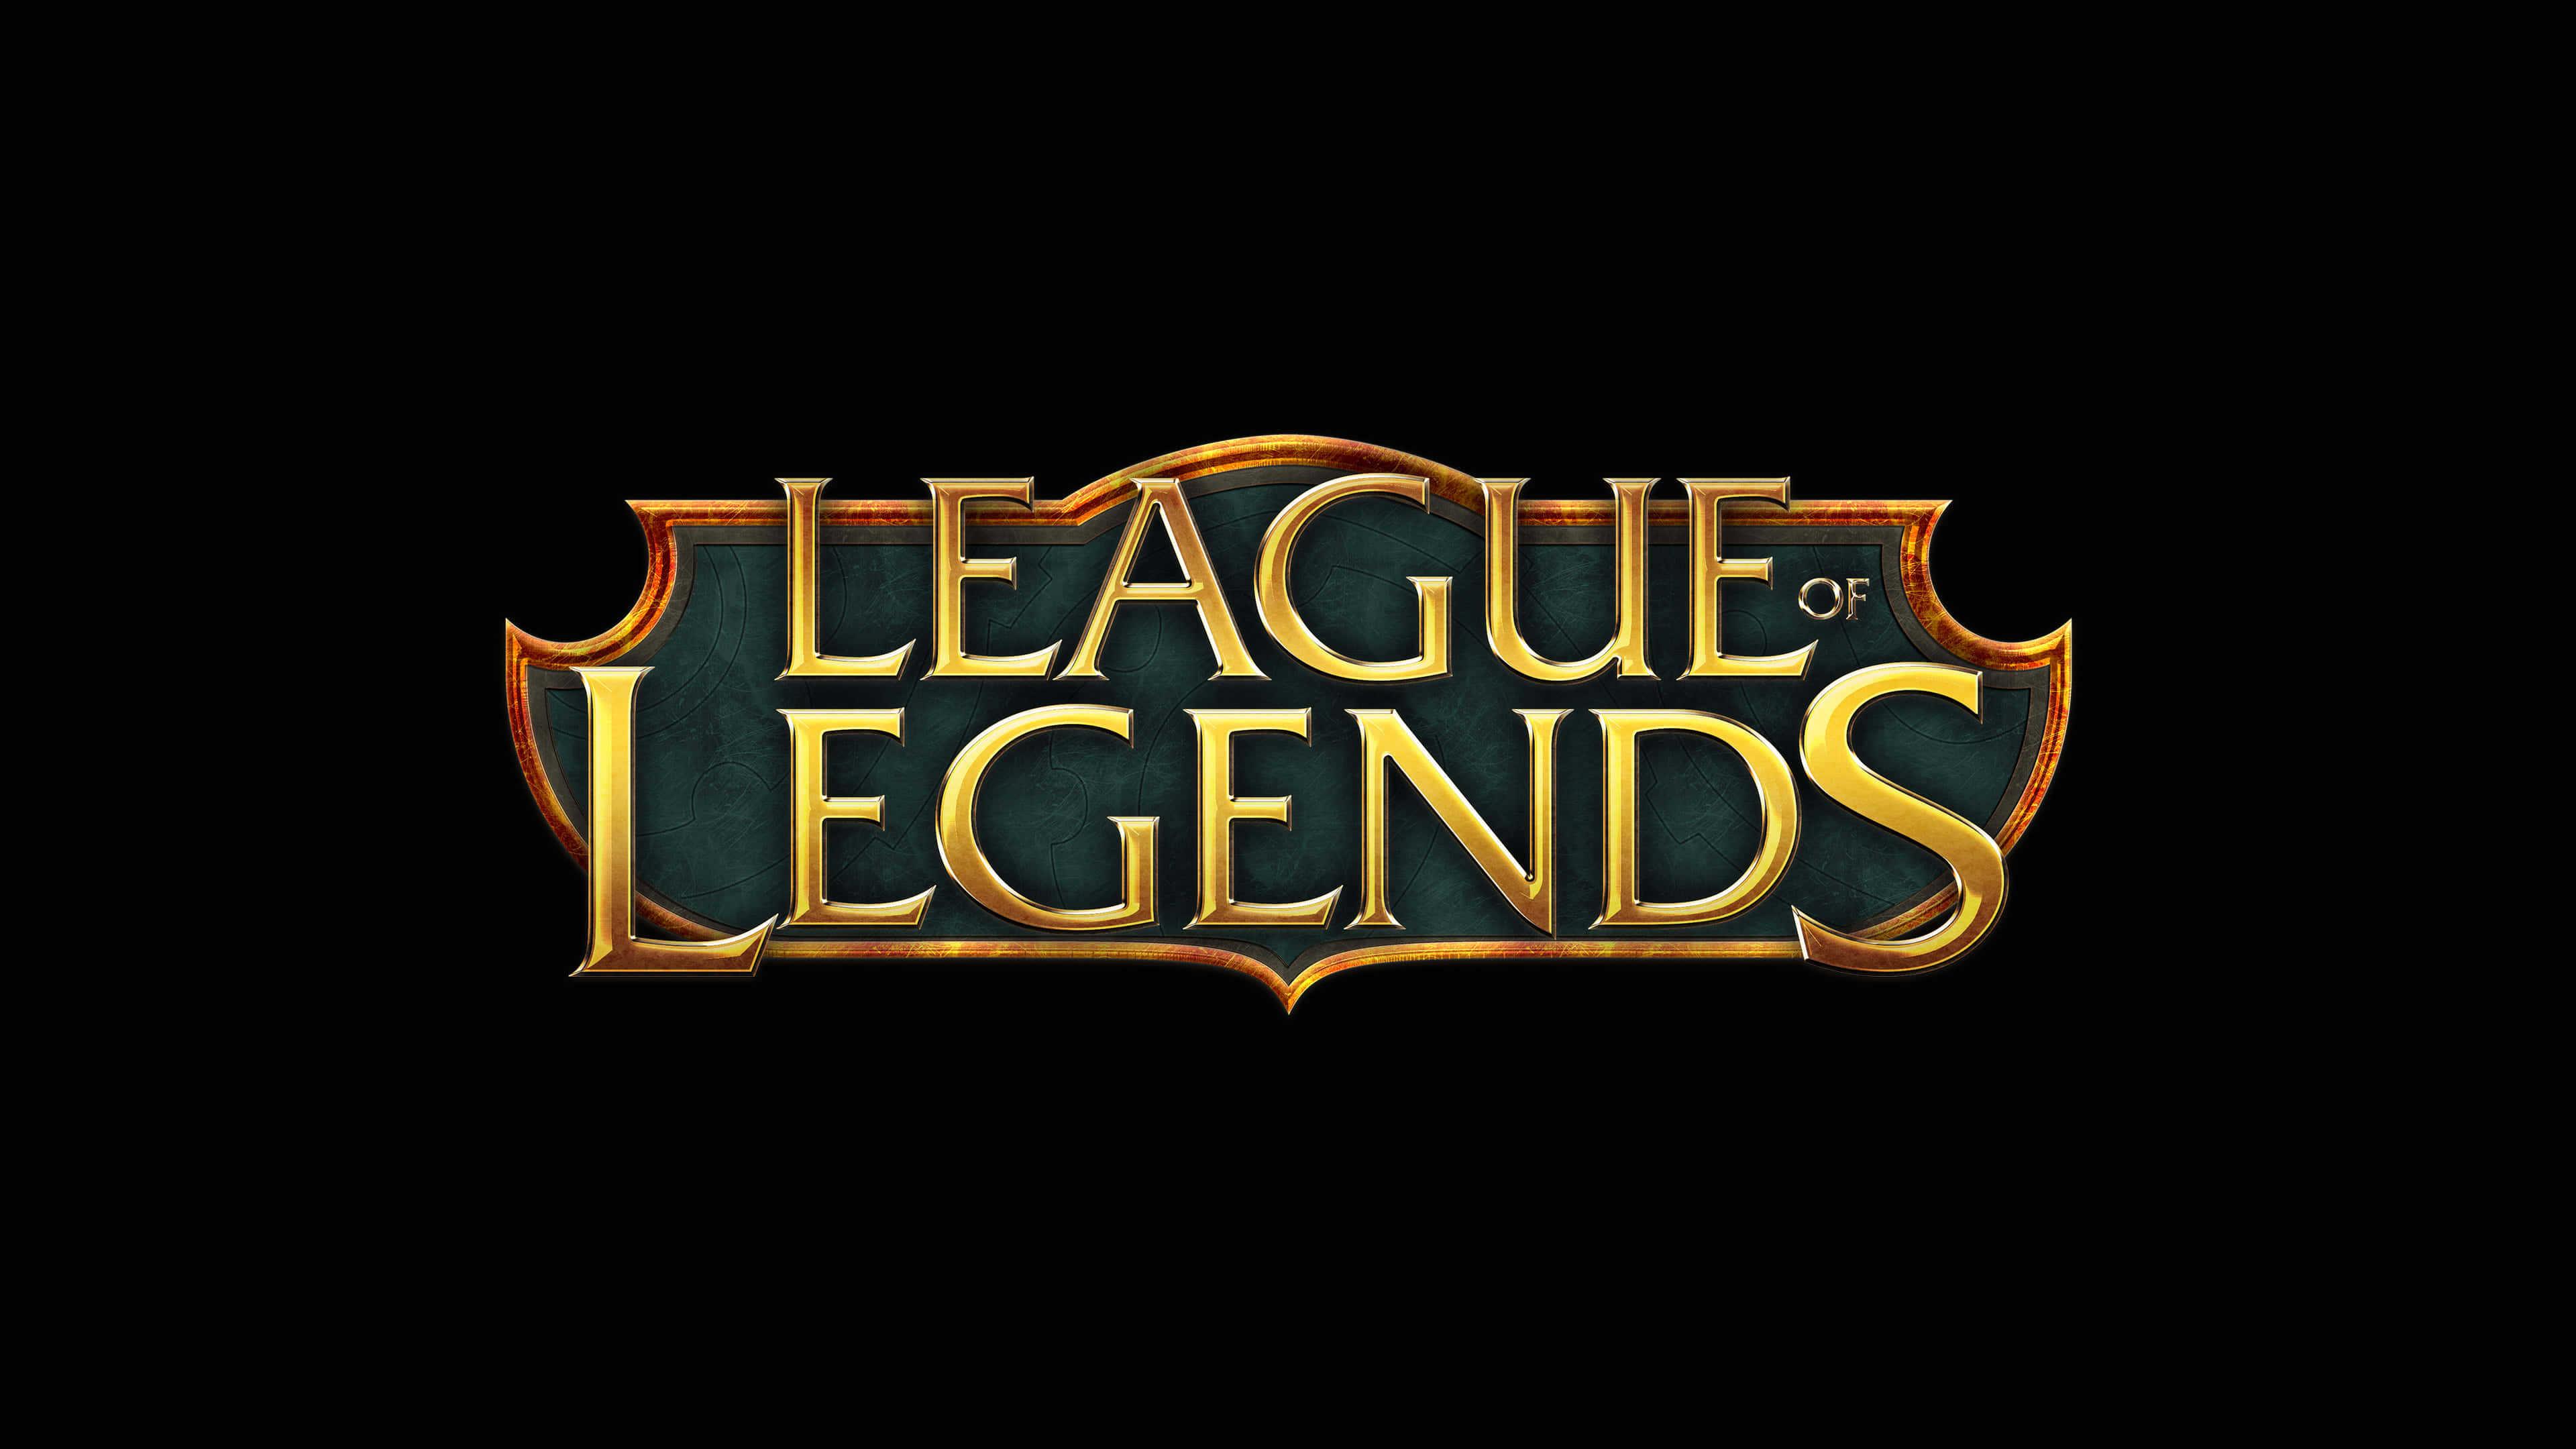 Cars Hd Mobile Wallpapers League Of Legends Logo Uhd 4k Wallpaper Pixelz